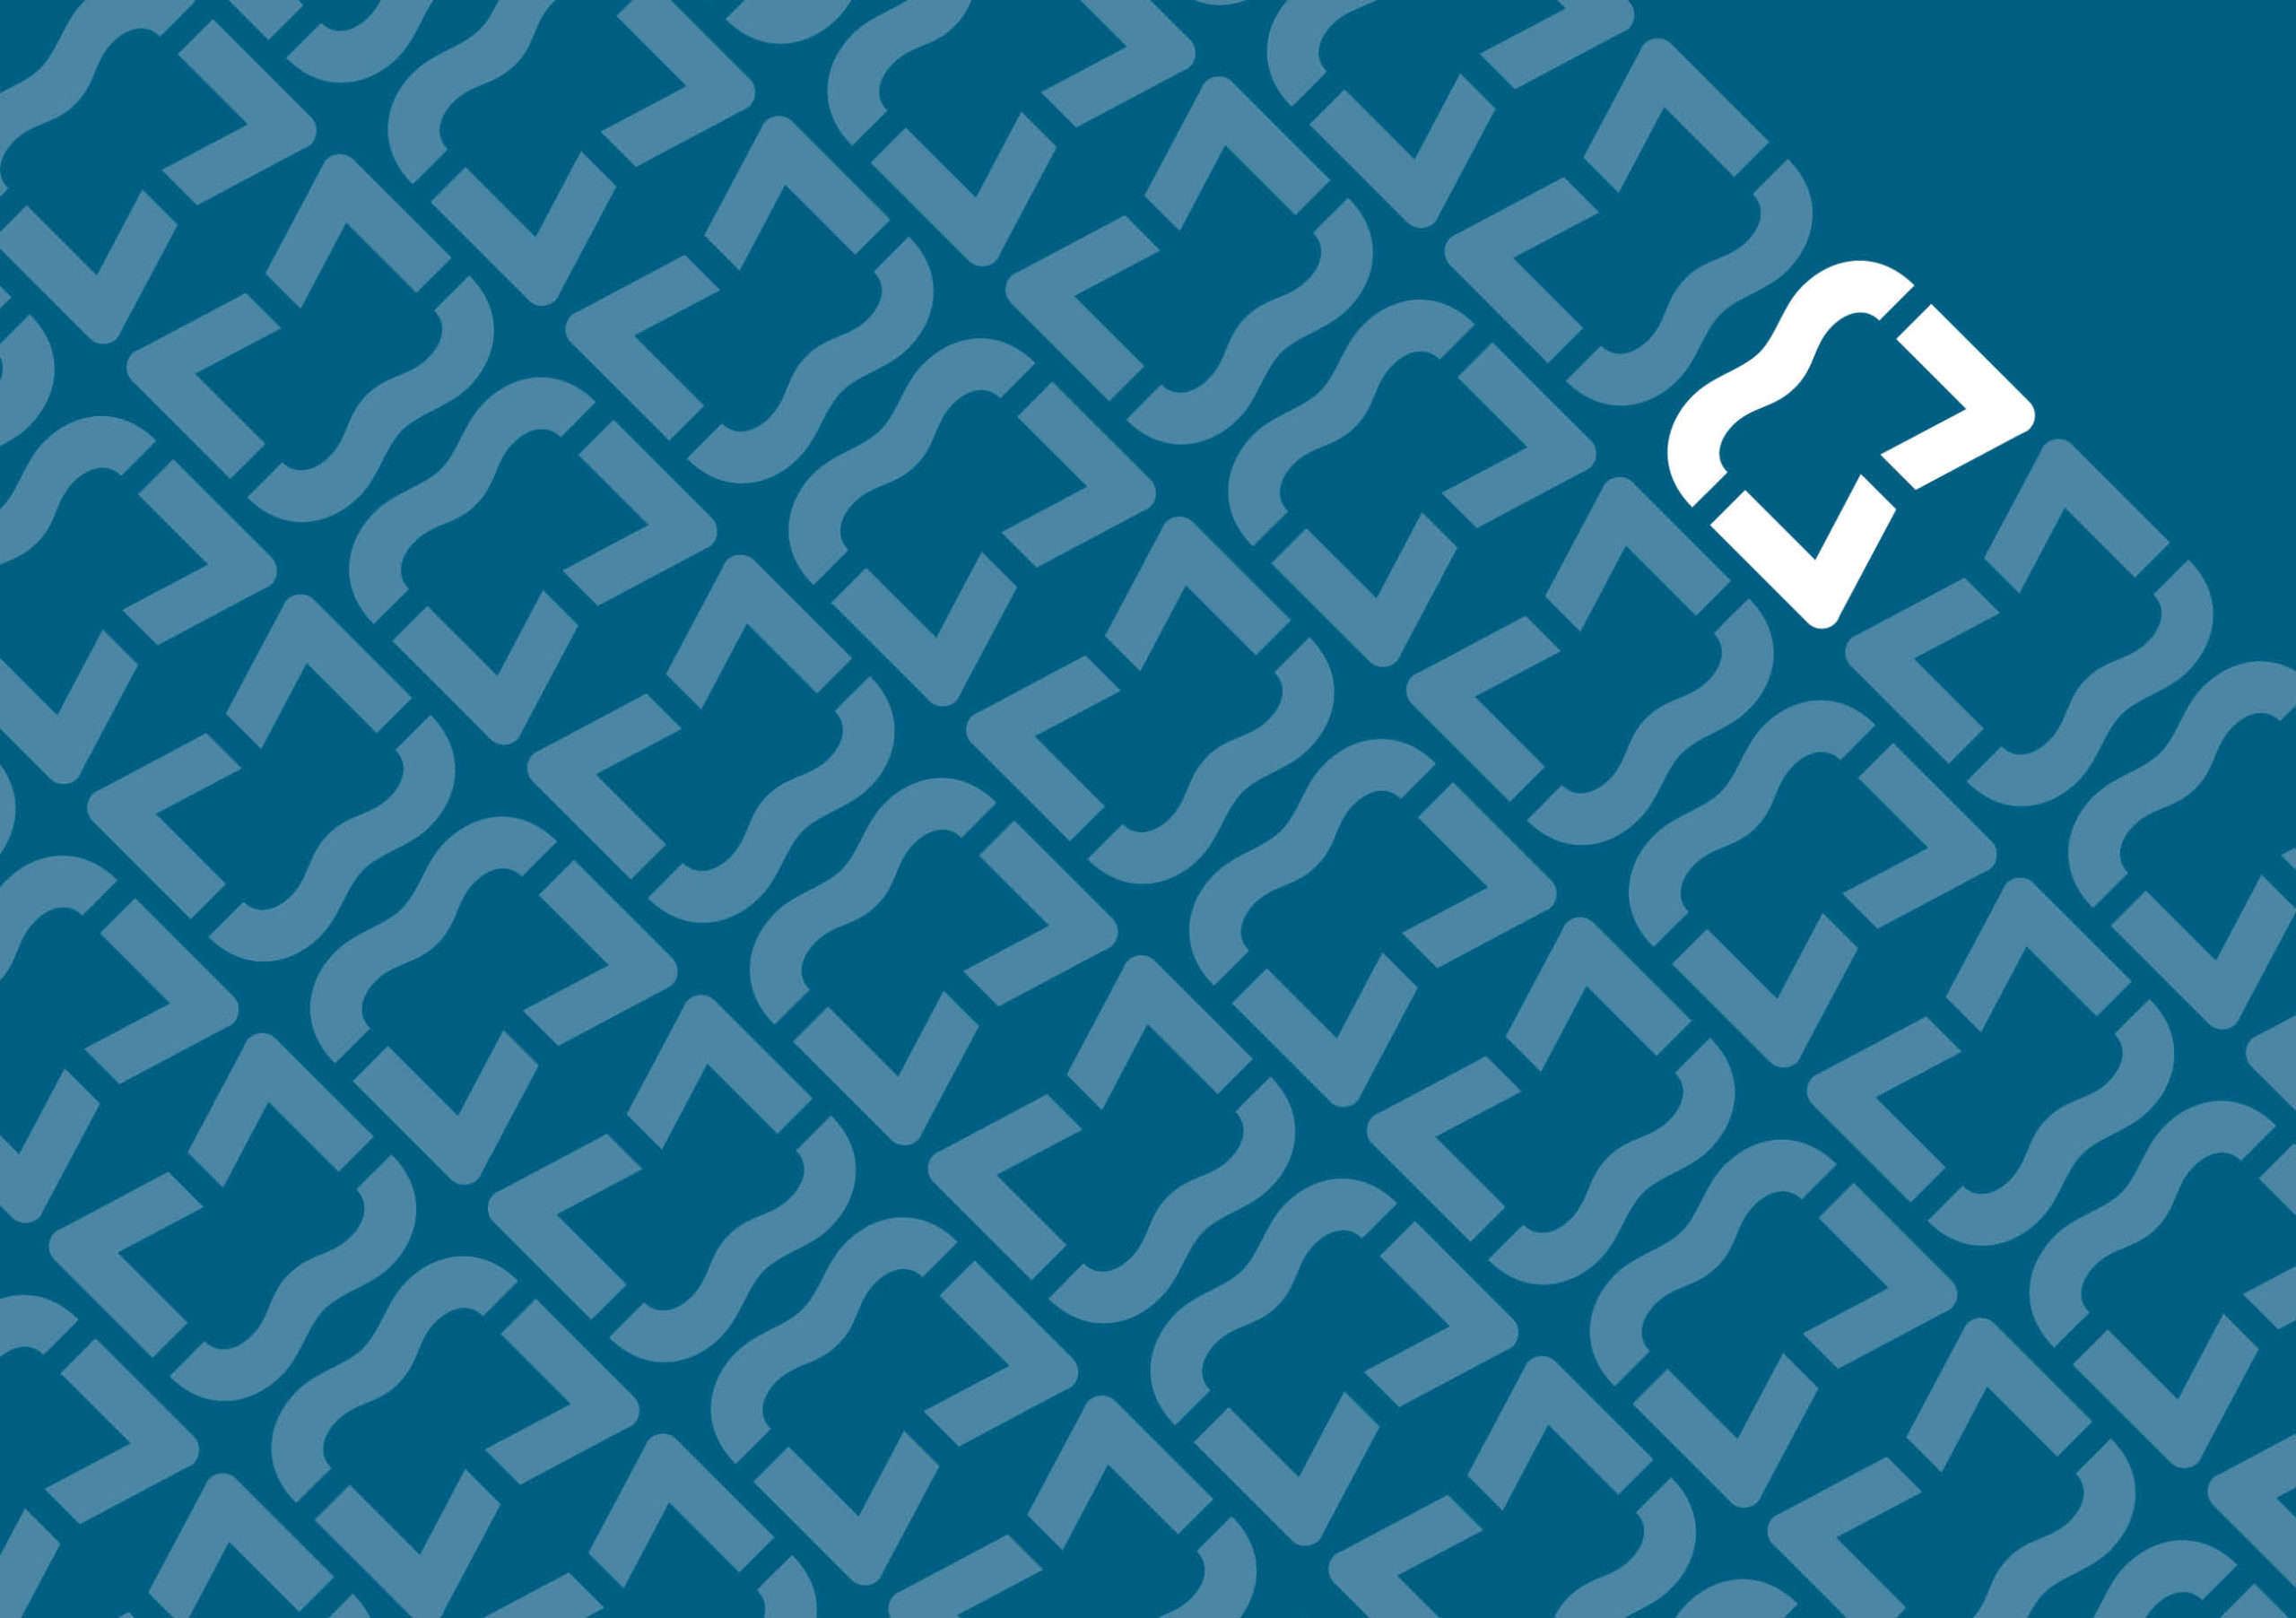 grafica logotip, sabadell disseny, disseny gràfic, disseny web sabadell